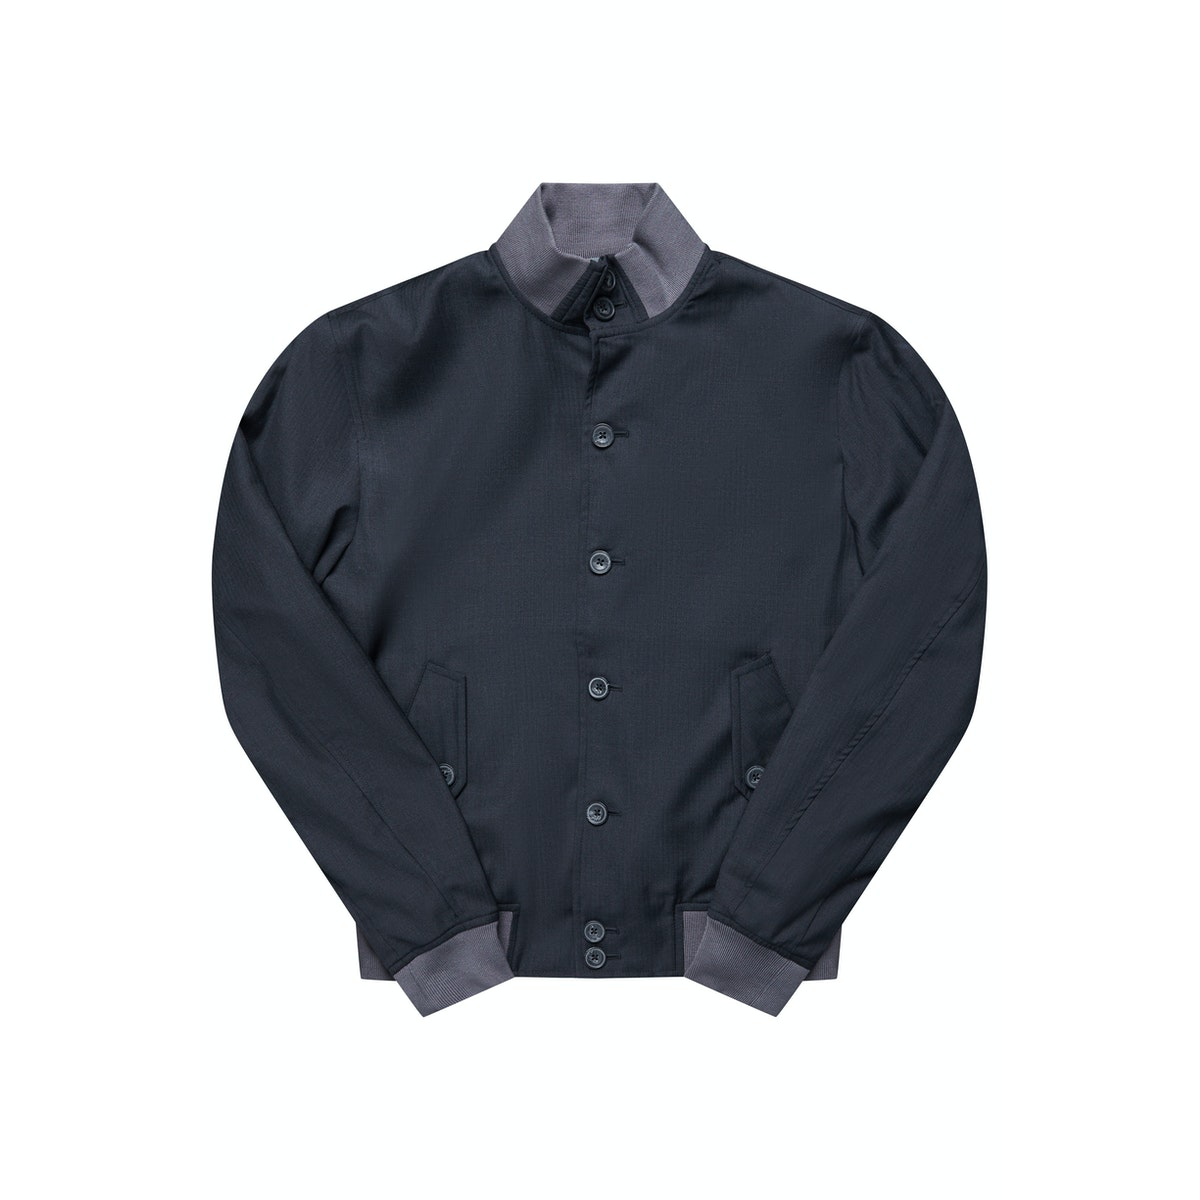 The Regent Charcoal Harrington Wool Jacket